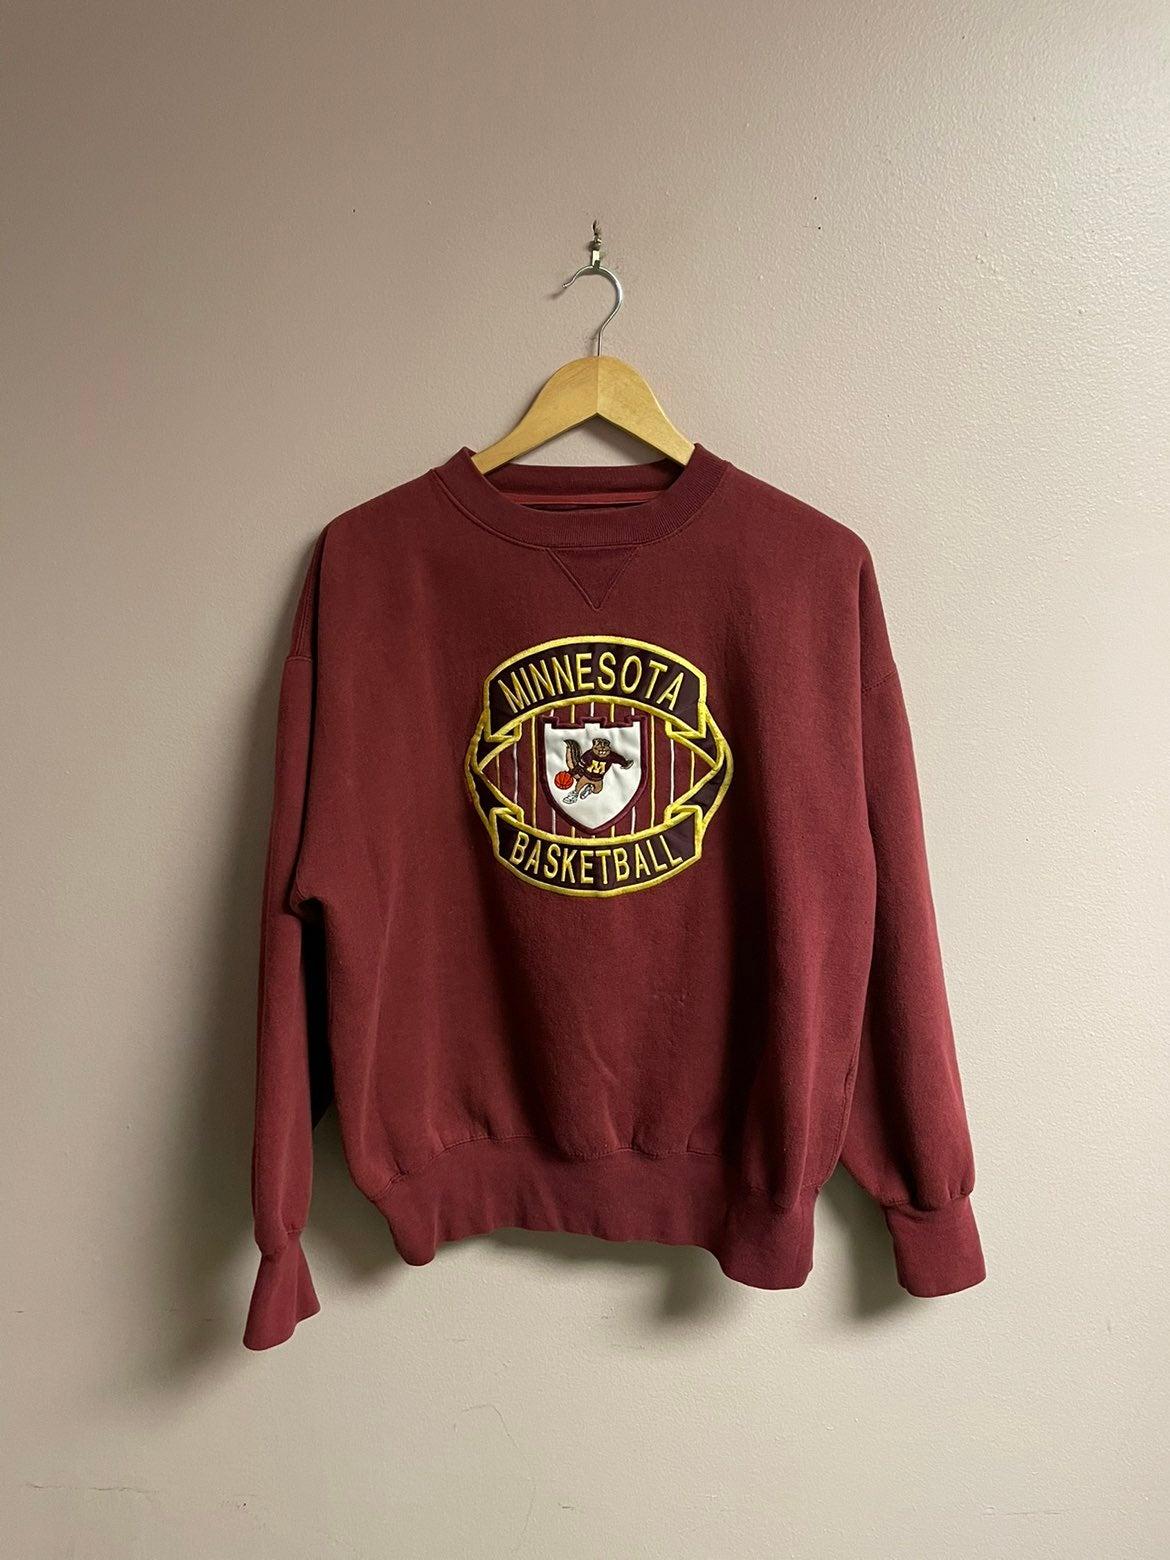 midwest embroidery minnesota sweatshirt